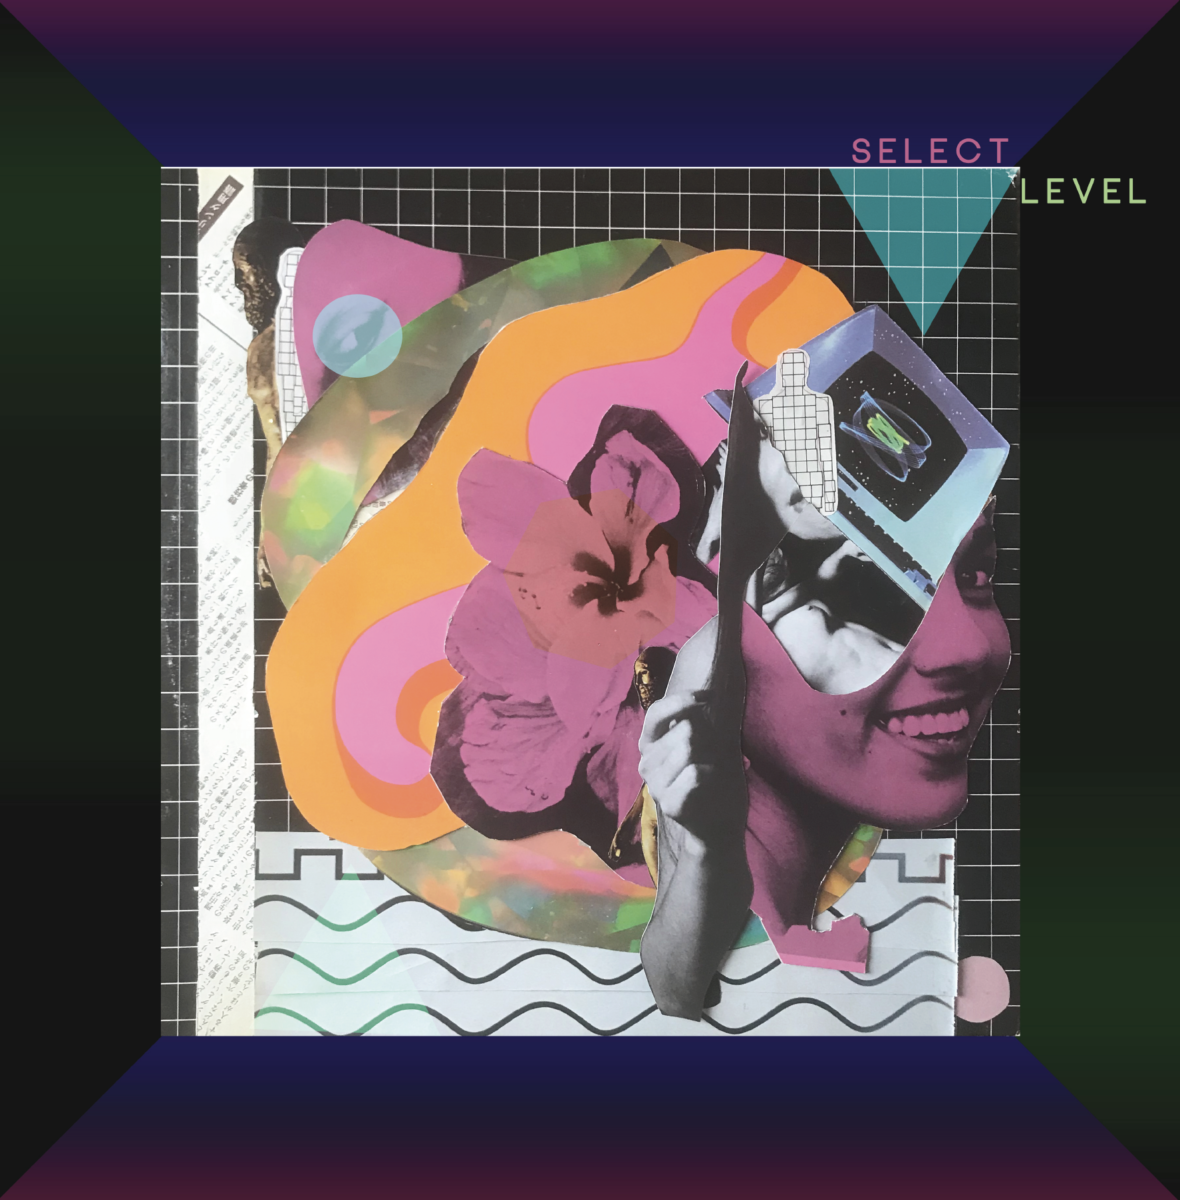 Select Level | Select level | 3hive.com